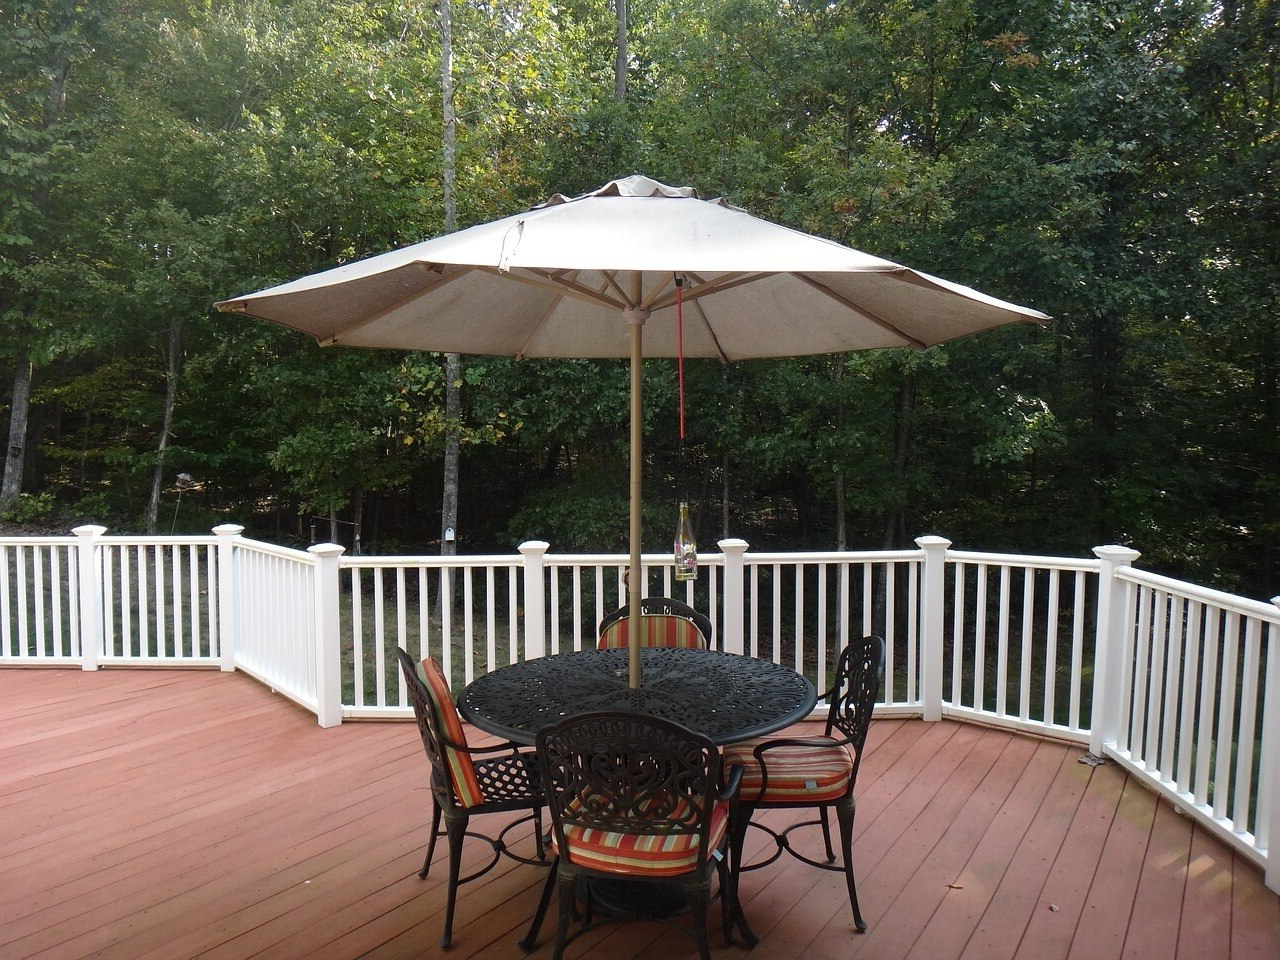 Latest Fleetwood Market Umbrellas With Regard To Outdoor Living – Umbrellas – Esbenshades (Gallery 20 of 20)